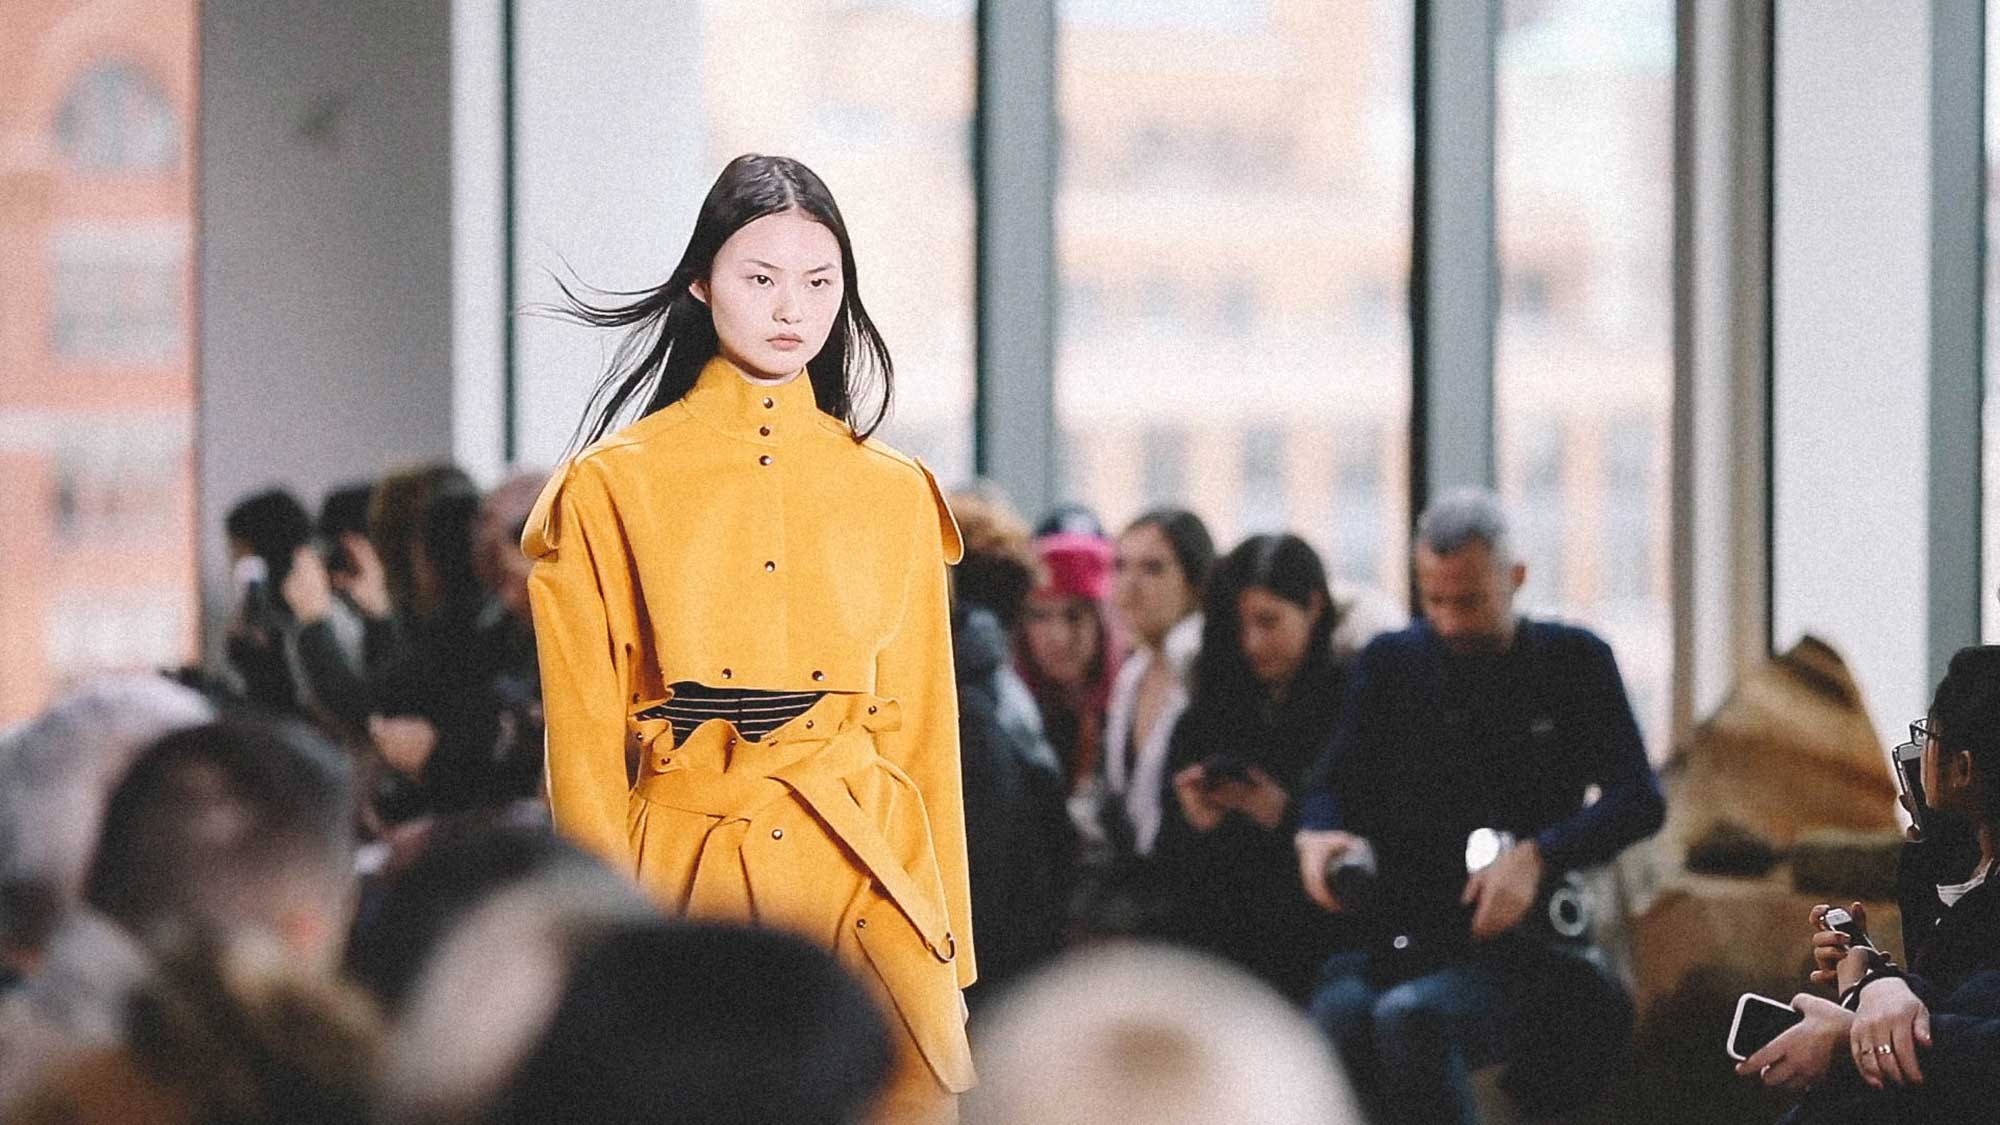 Lacoste-Runway-Show-New-York-Fashion-Week-4.jpg